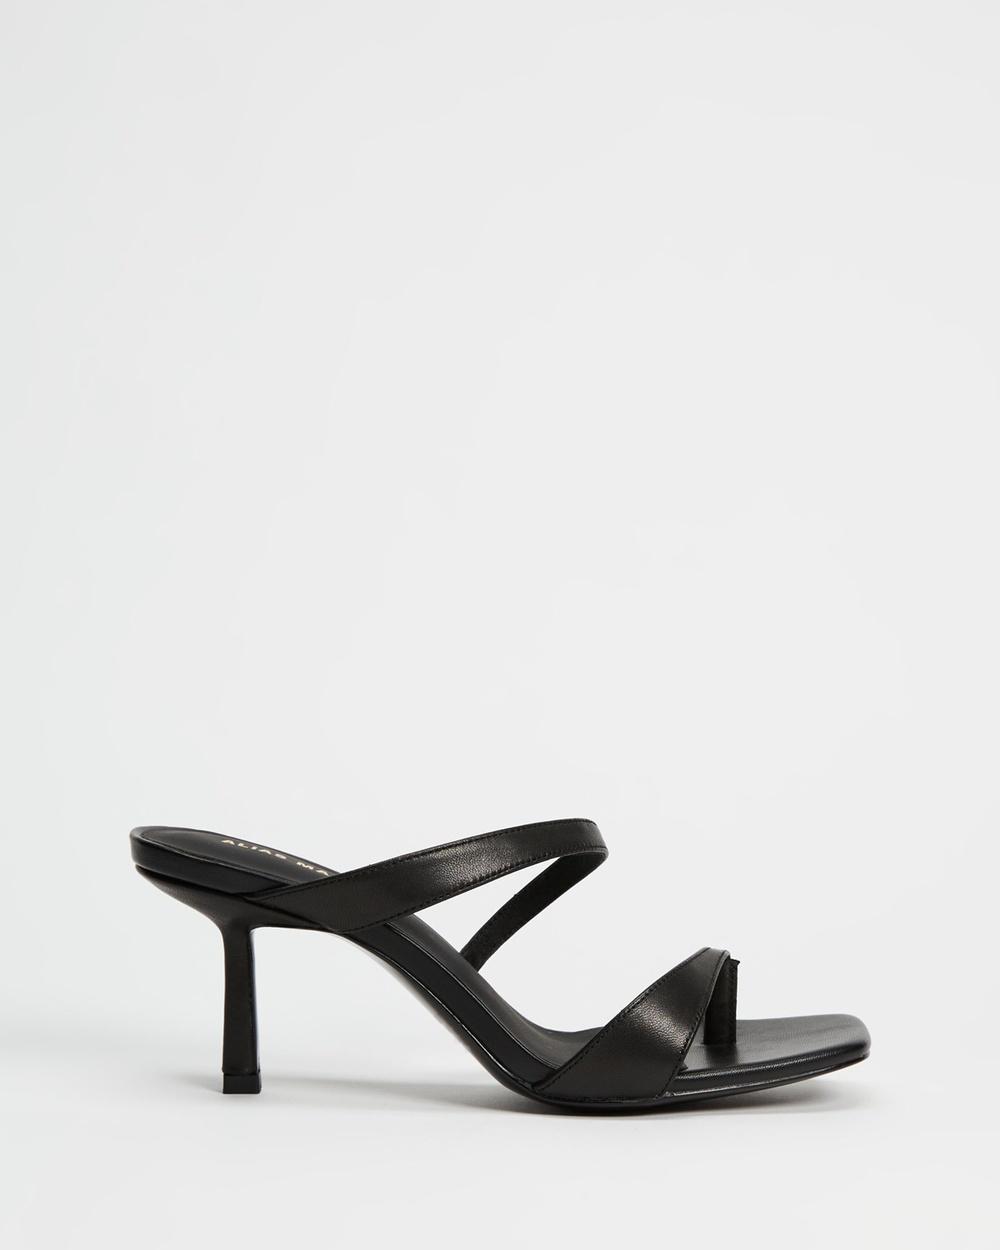 Alias Mae Lizzy Sandals Black Leather